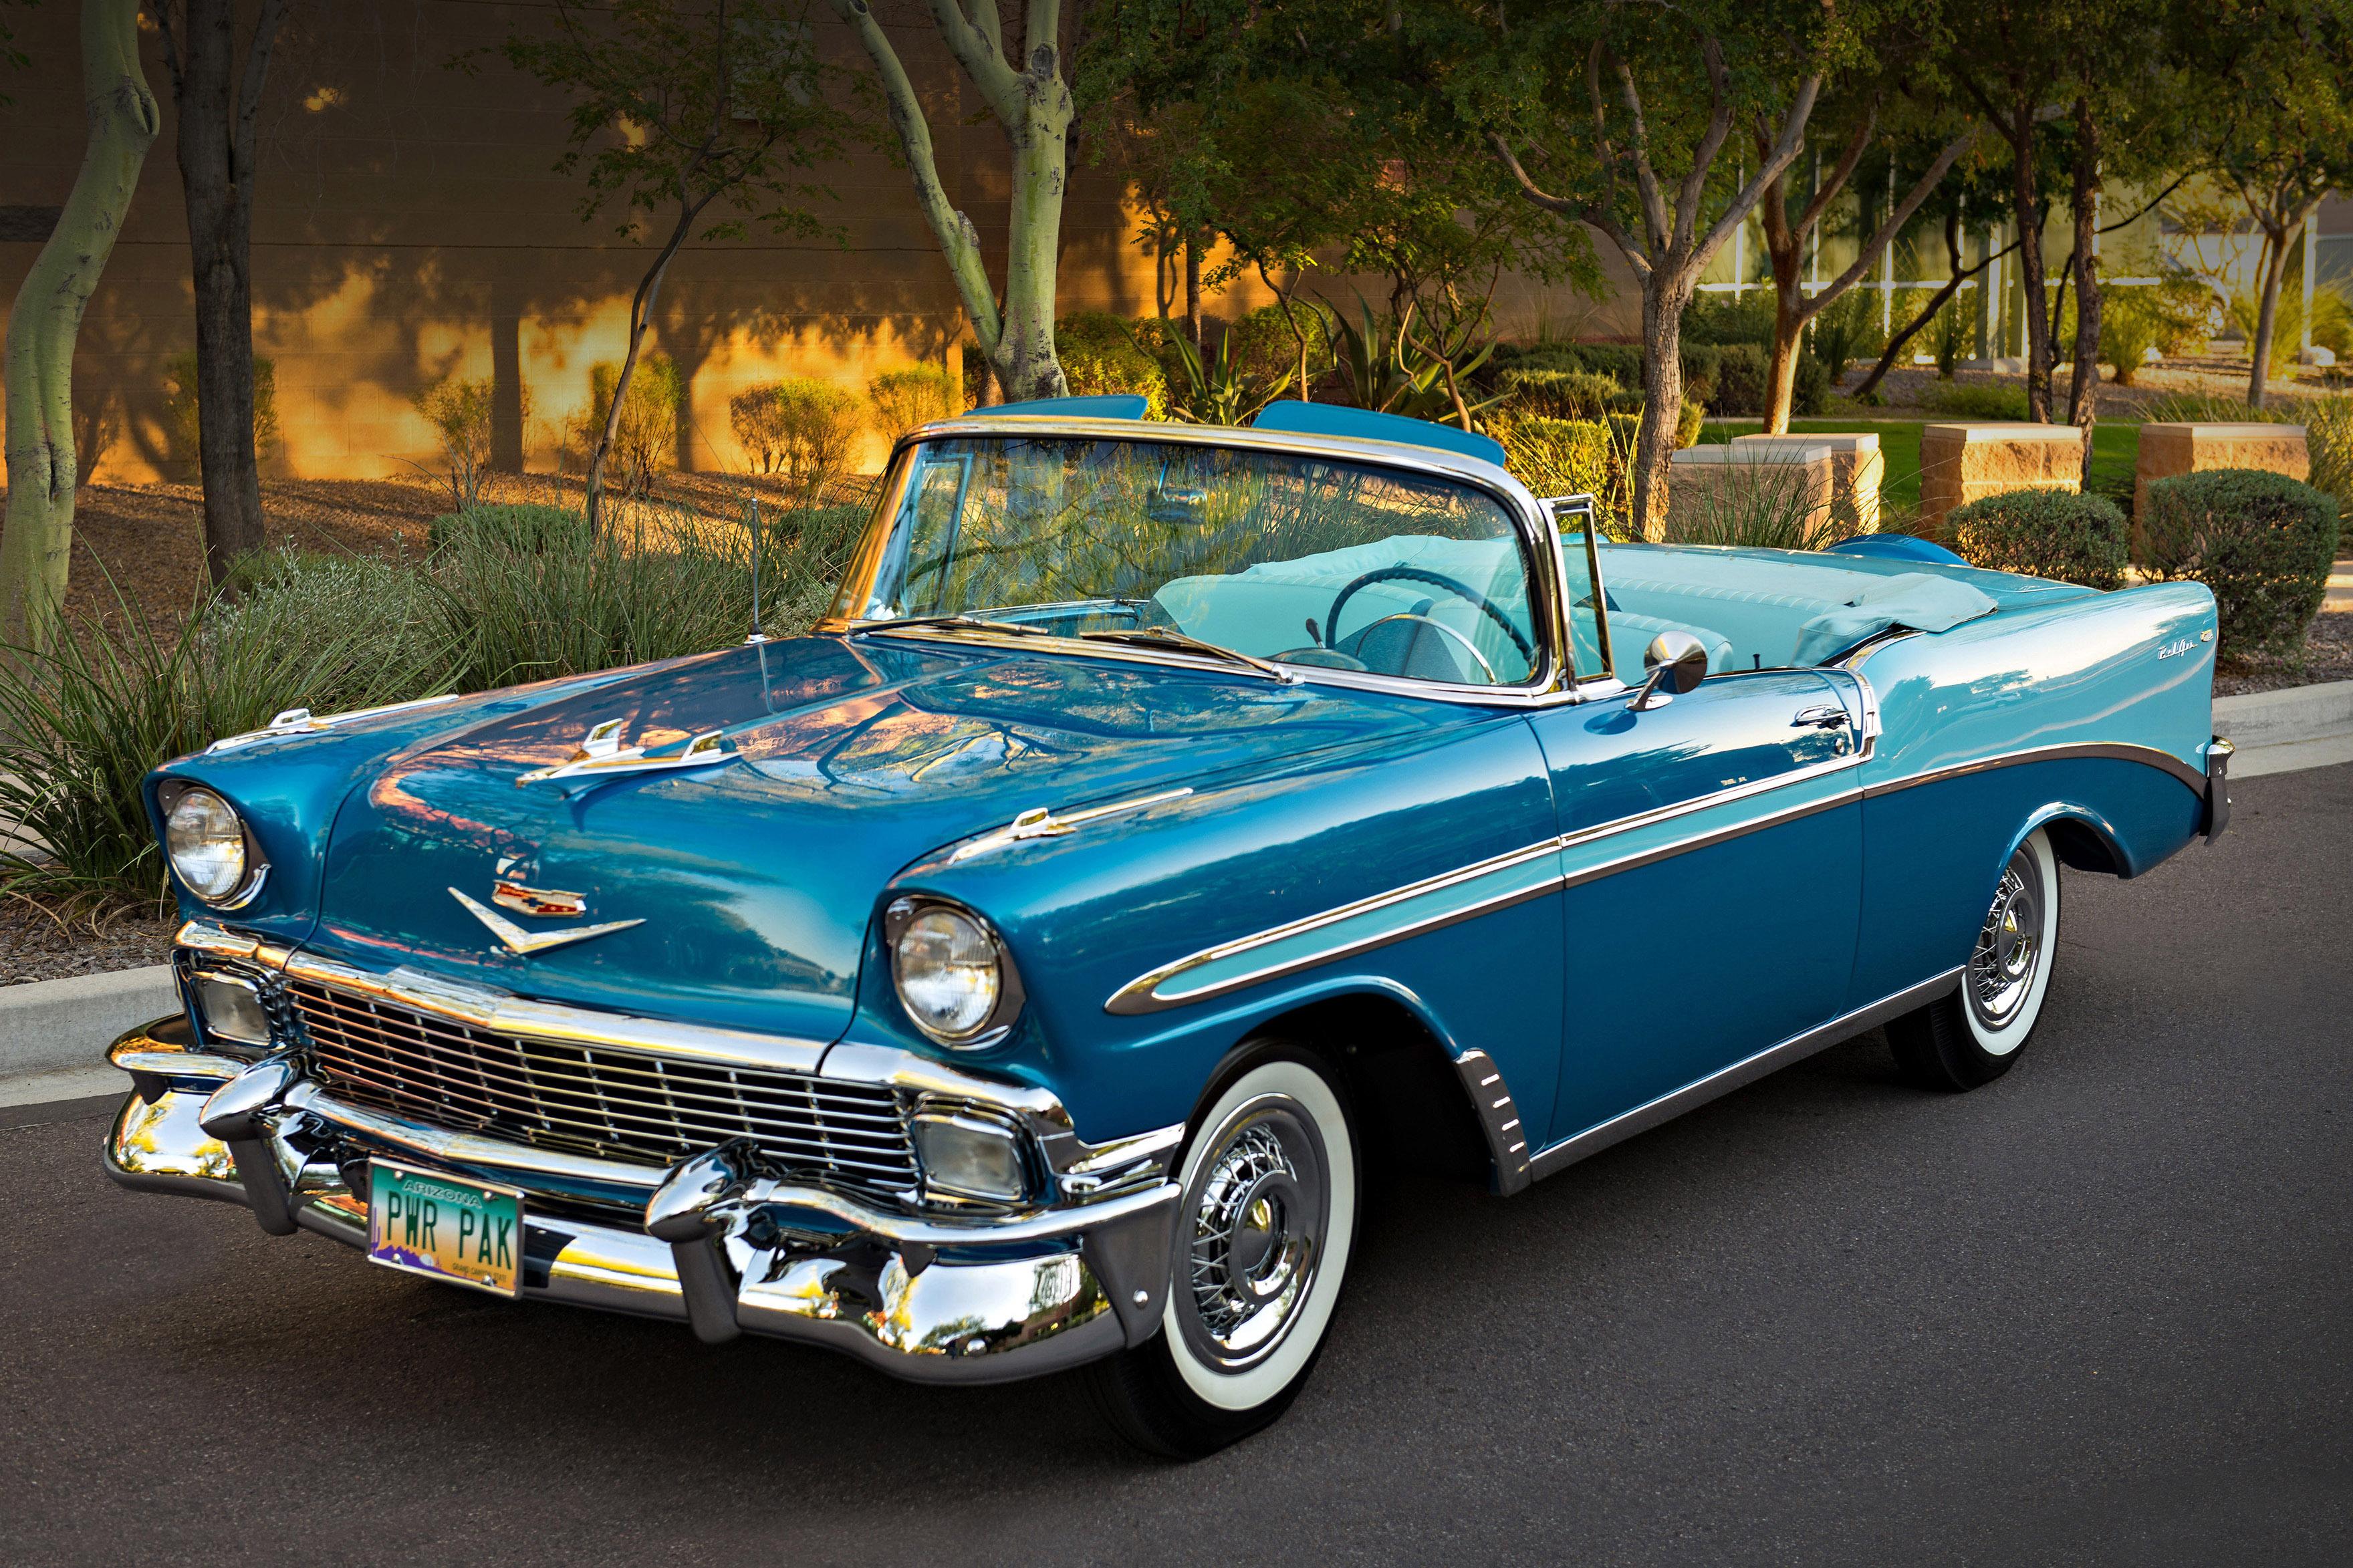 Belair Auto Auction >> Barrett Jackson Auction 15 Of The Hottest Classic Cars For Sale